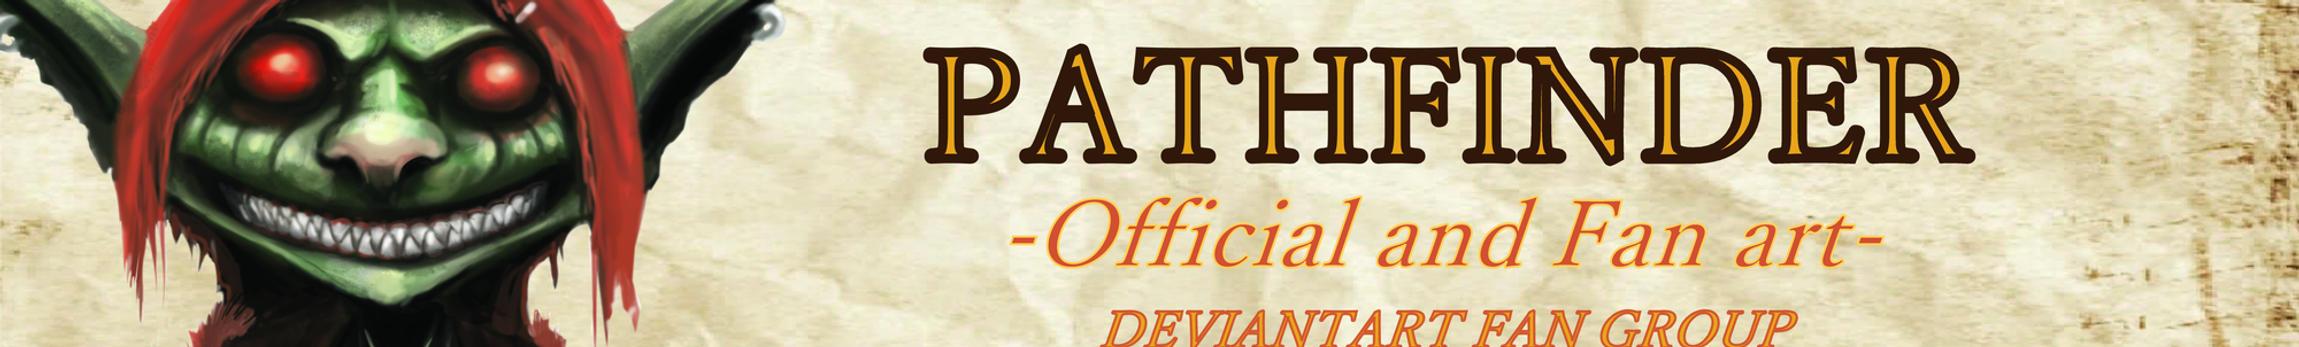 Pathfinder-Art new group by Fantasy-NPC by LJEKC